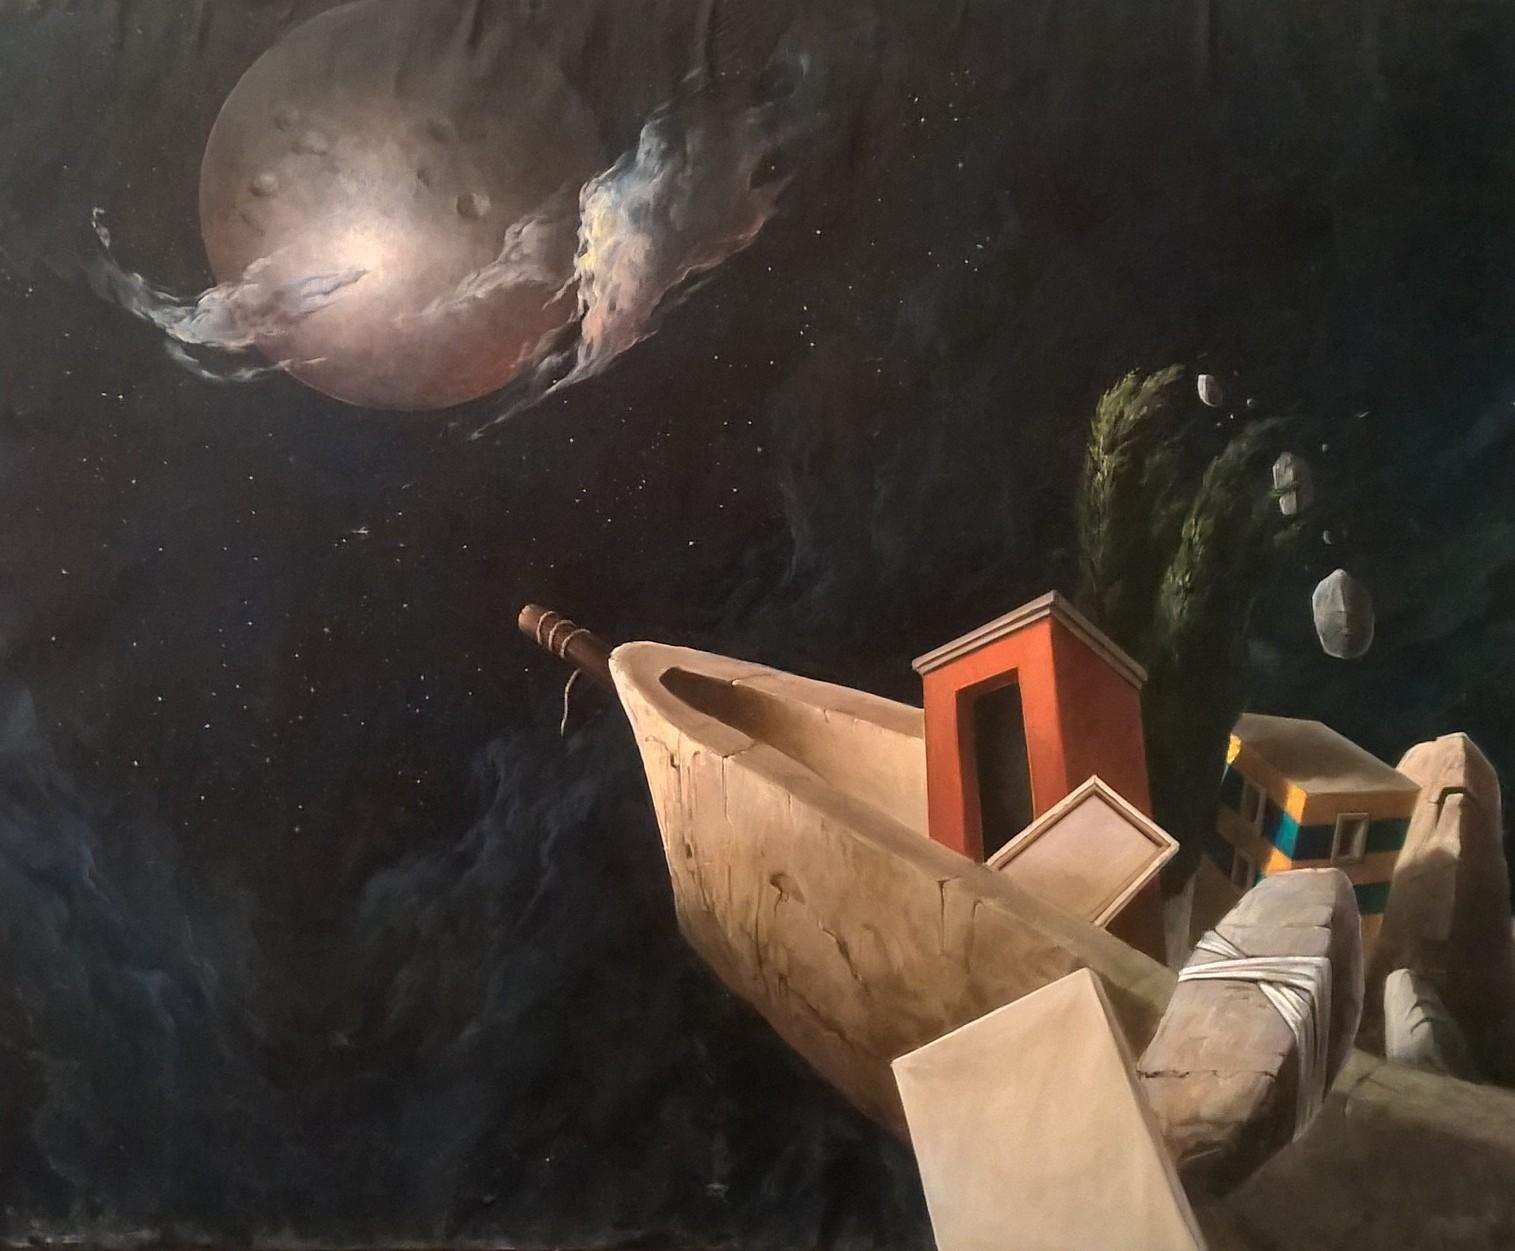 Verso un Sogno by  Ciro Palumbo - Masterpiece Online